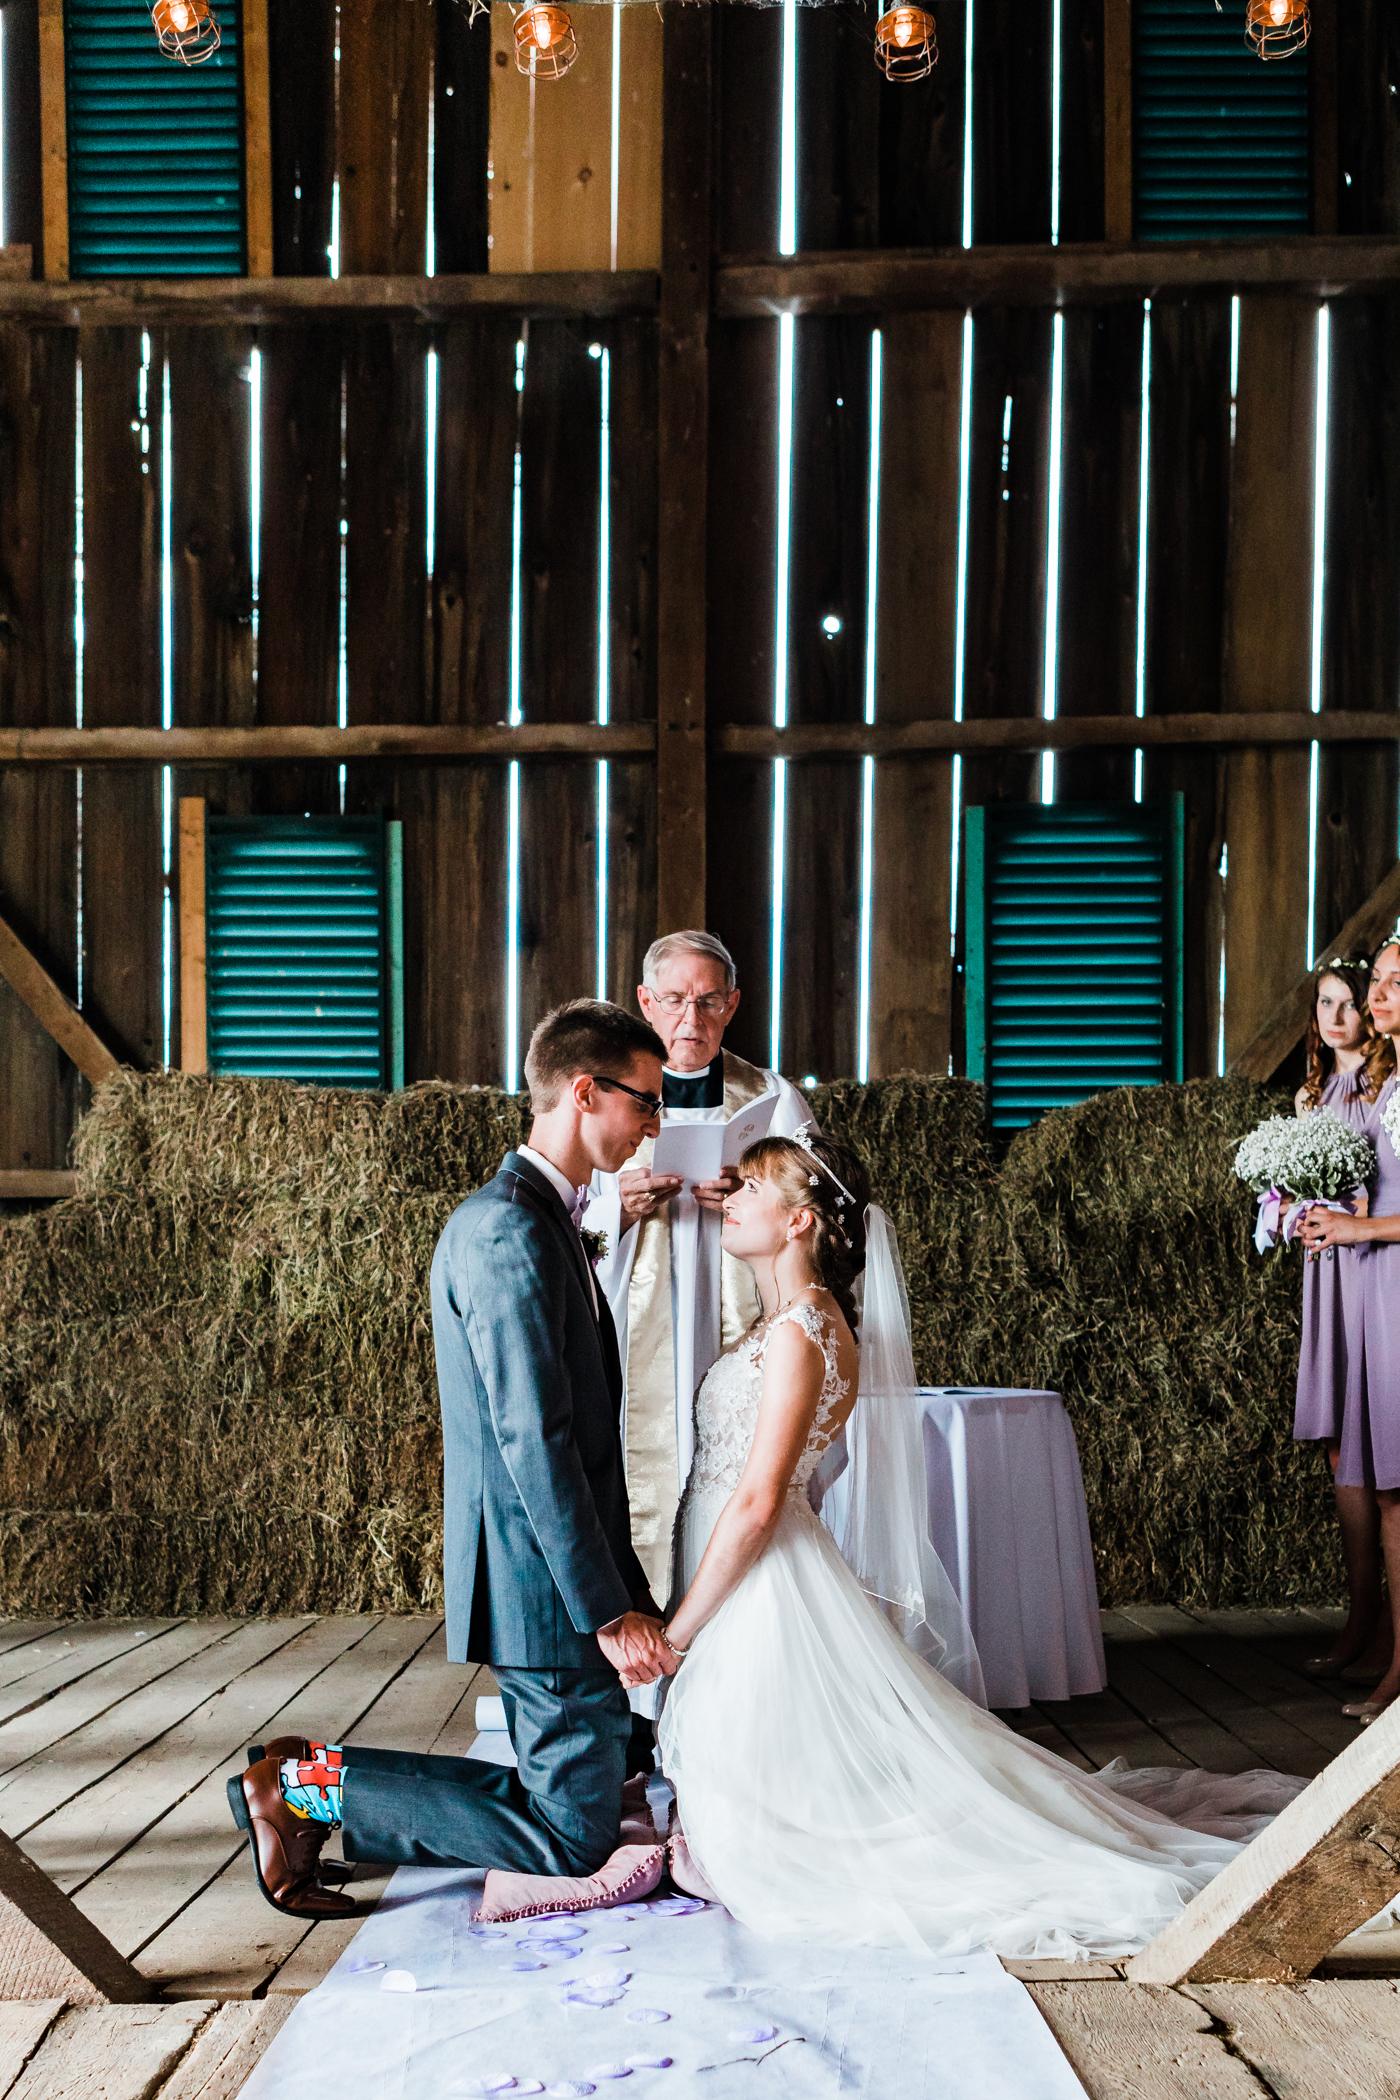 non traditional wedding ceremony ideas - maryland wedding - barn venues in maryland